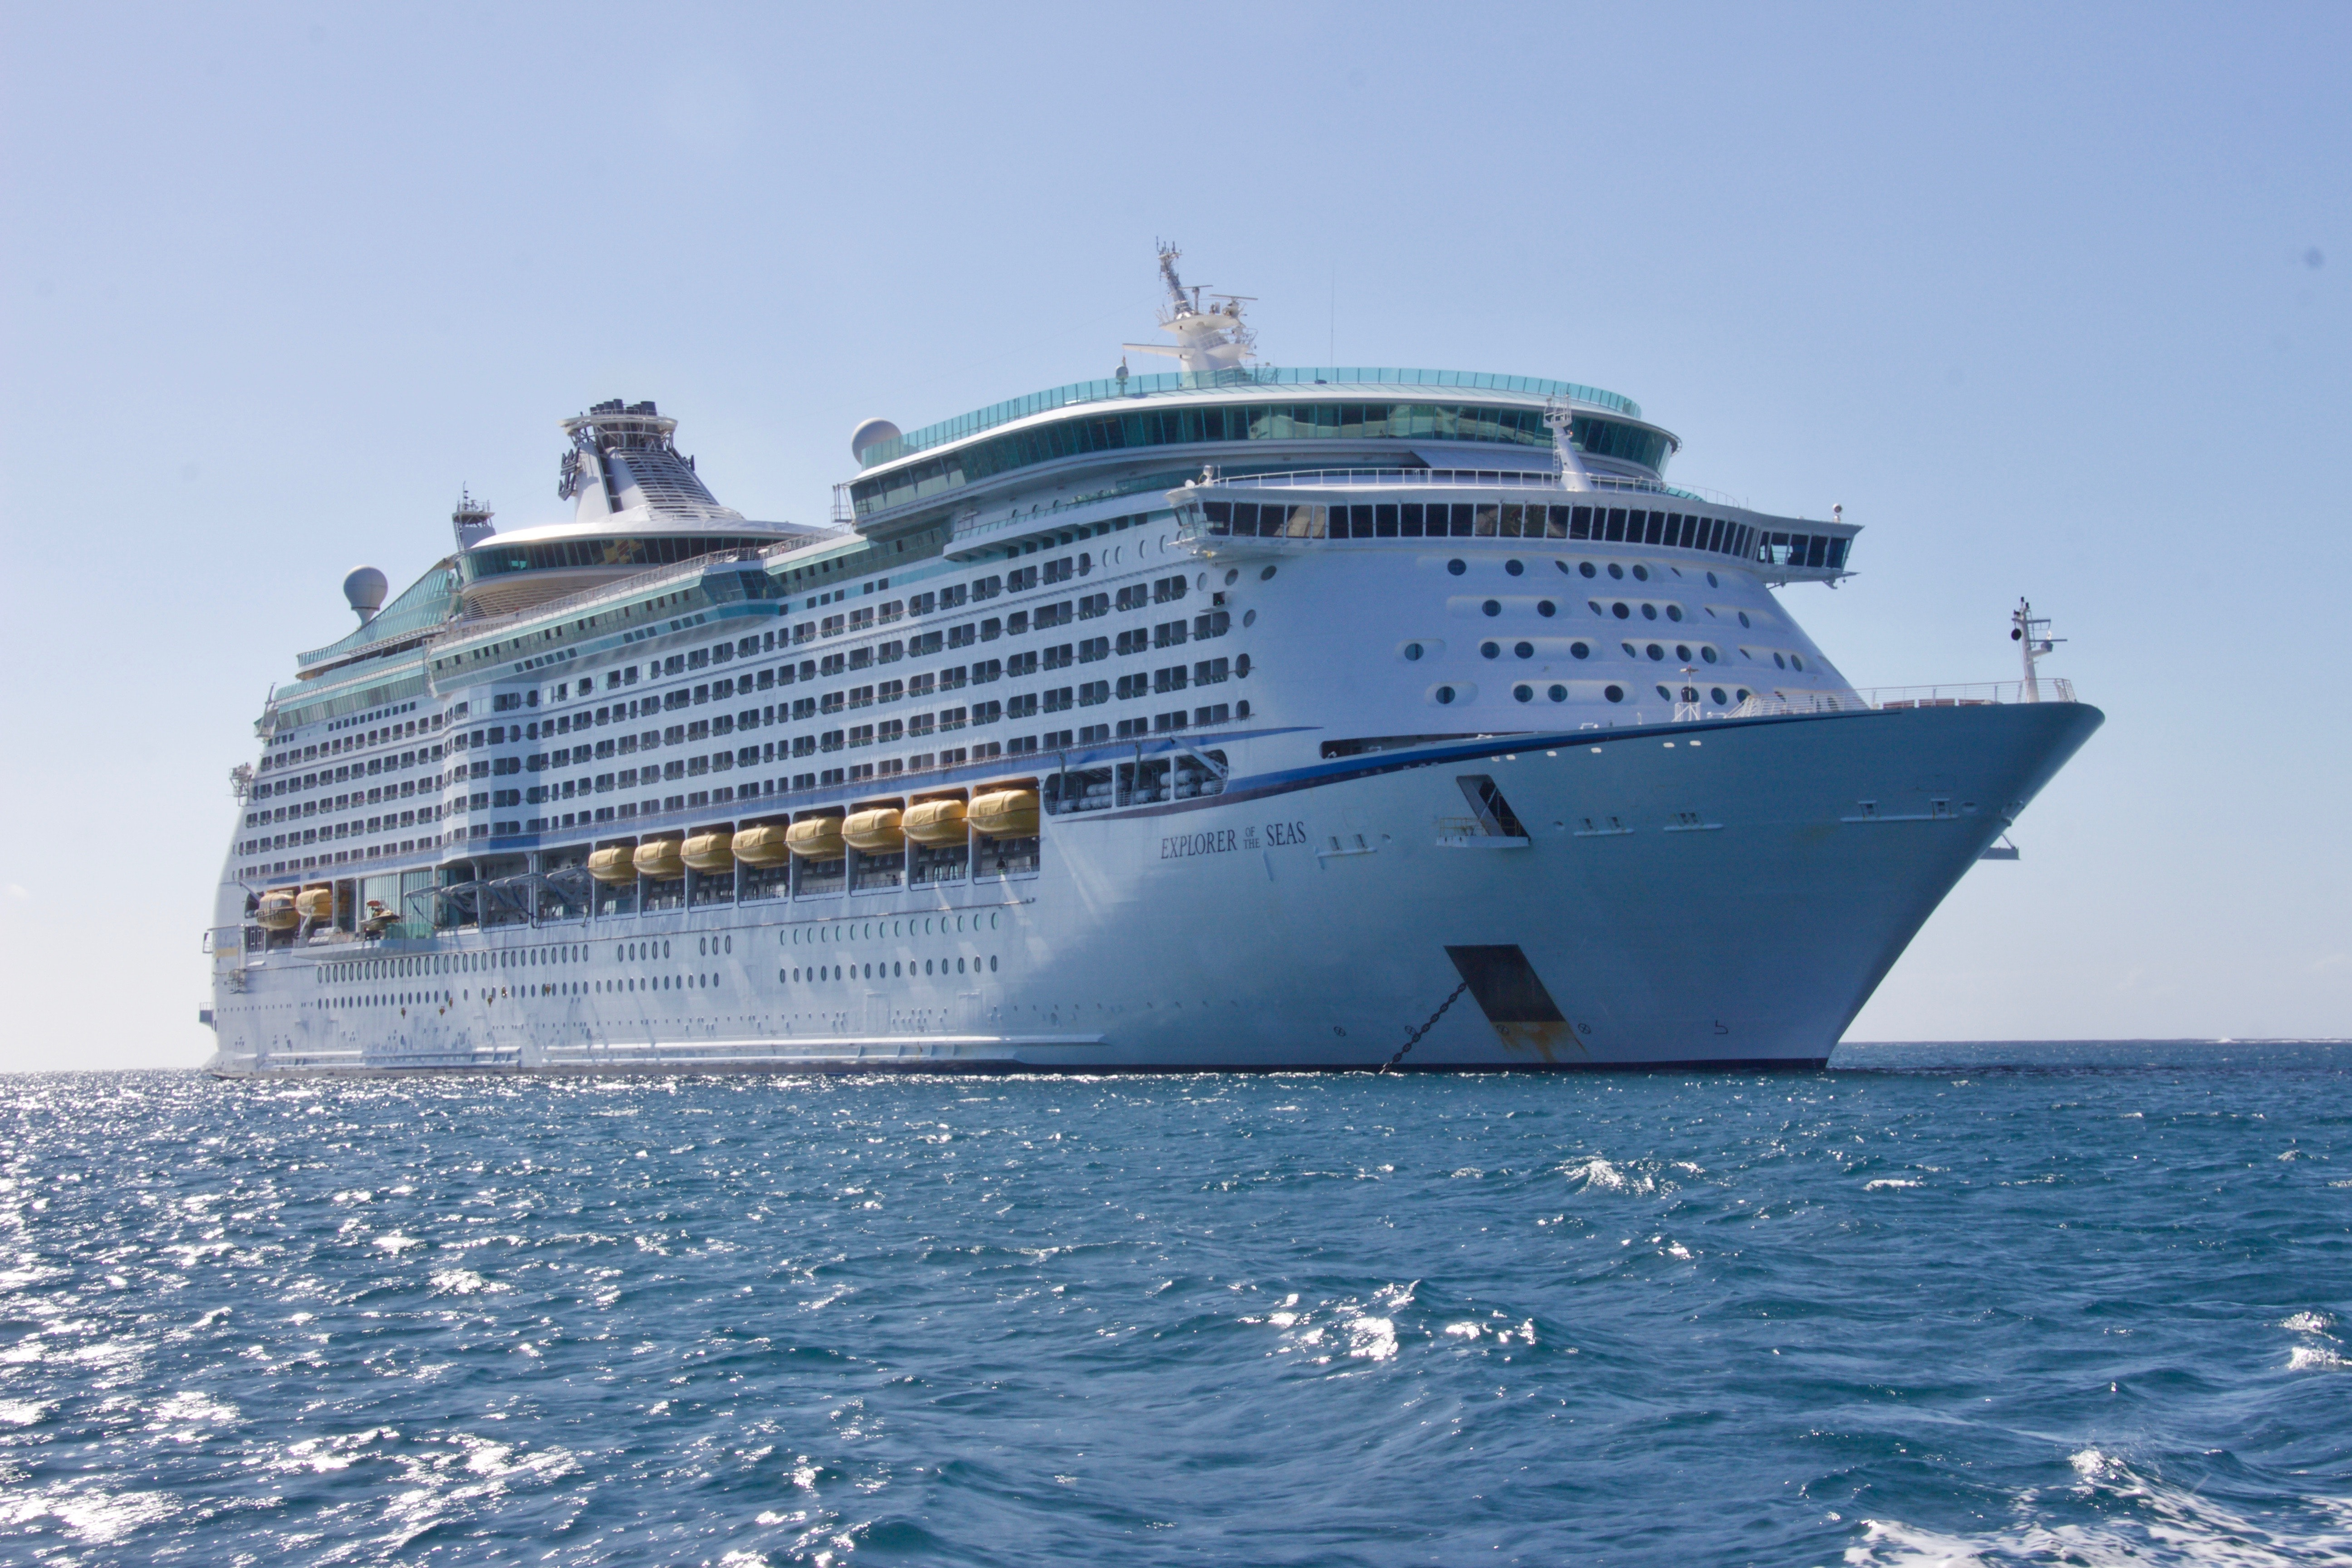 White Cruise Ship, Clouds, Ship, Watercraft, Water, HQ Photo